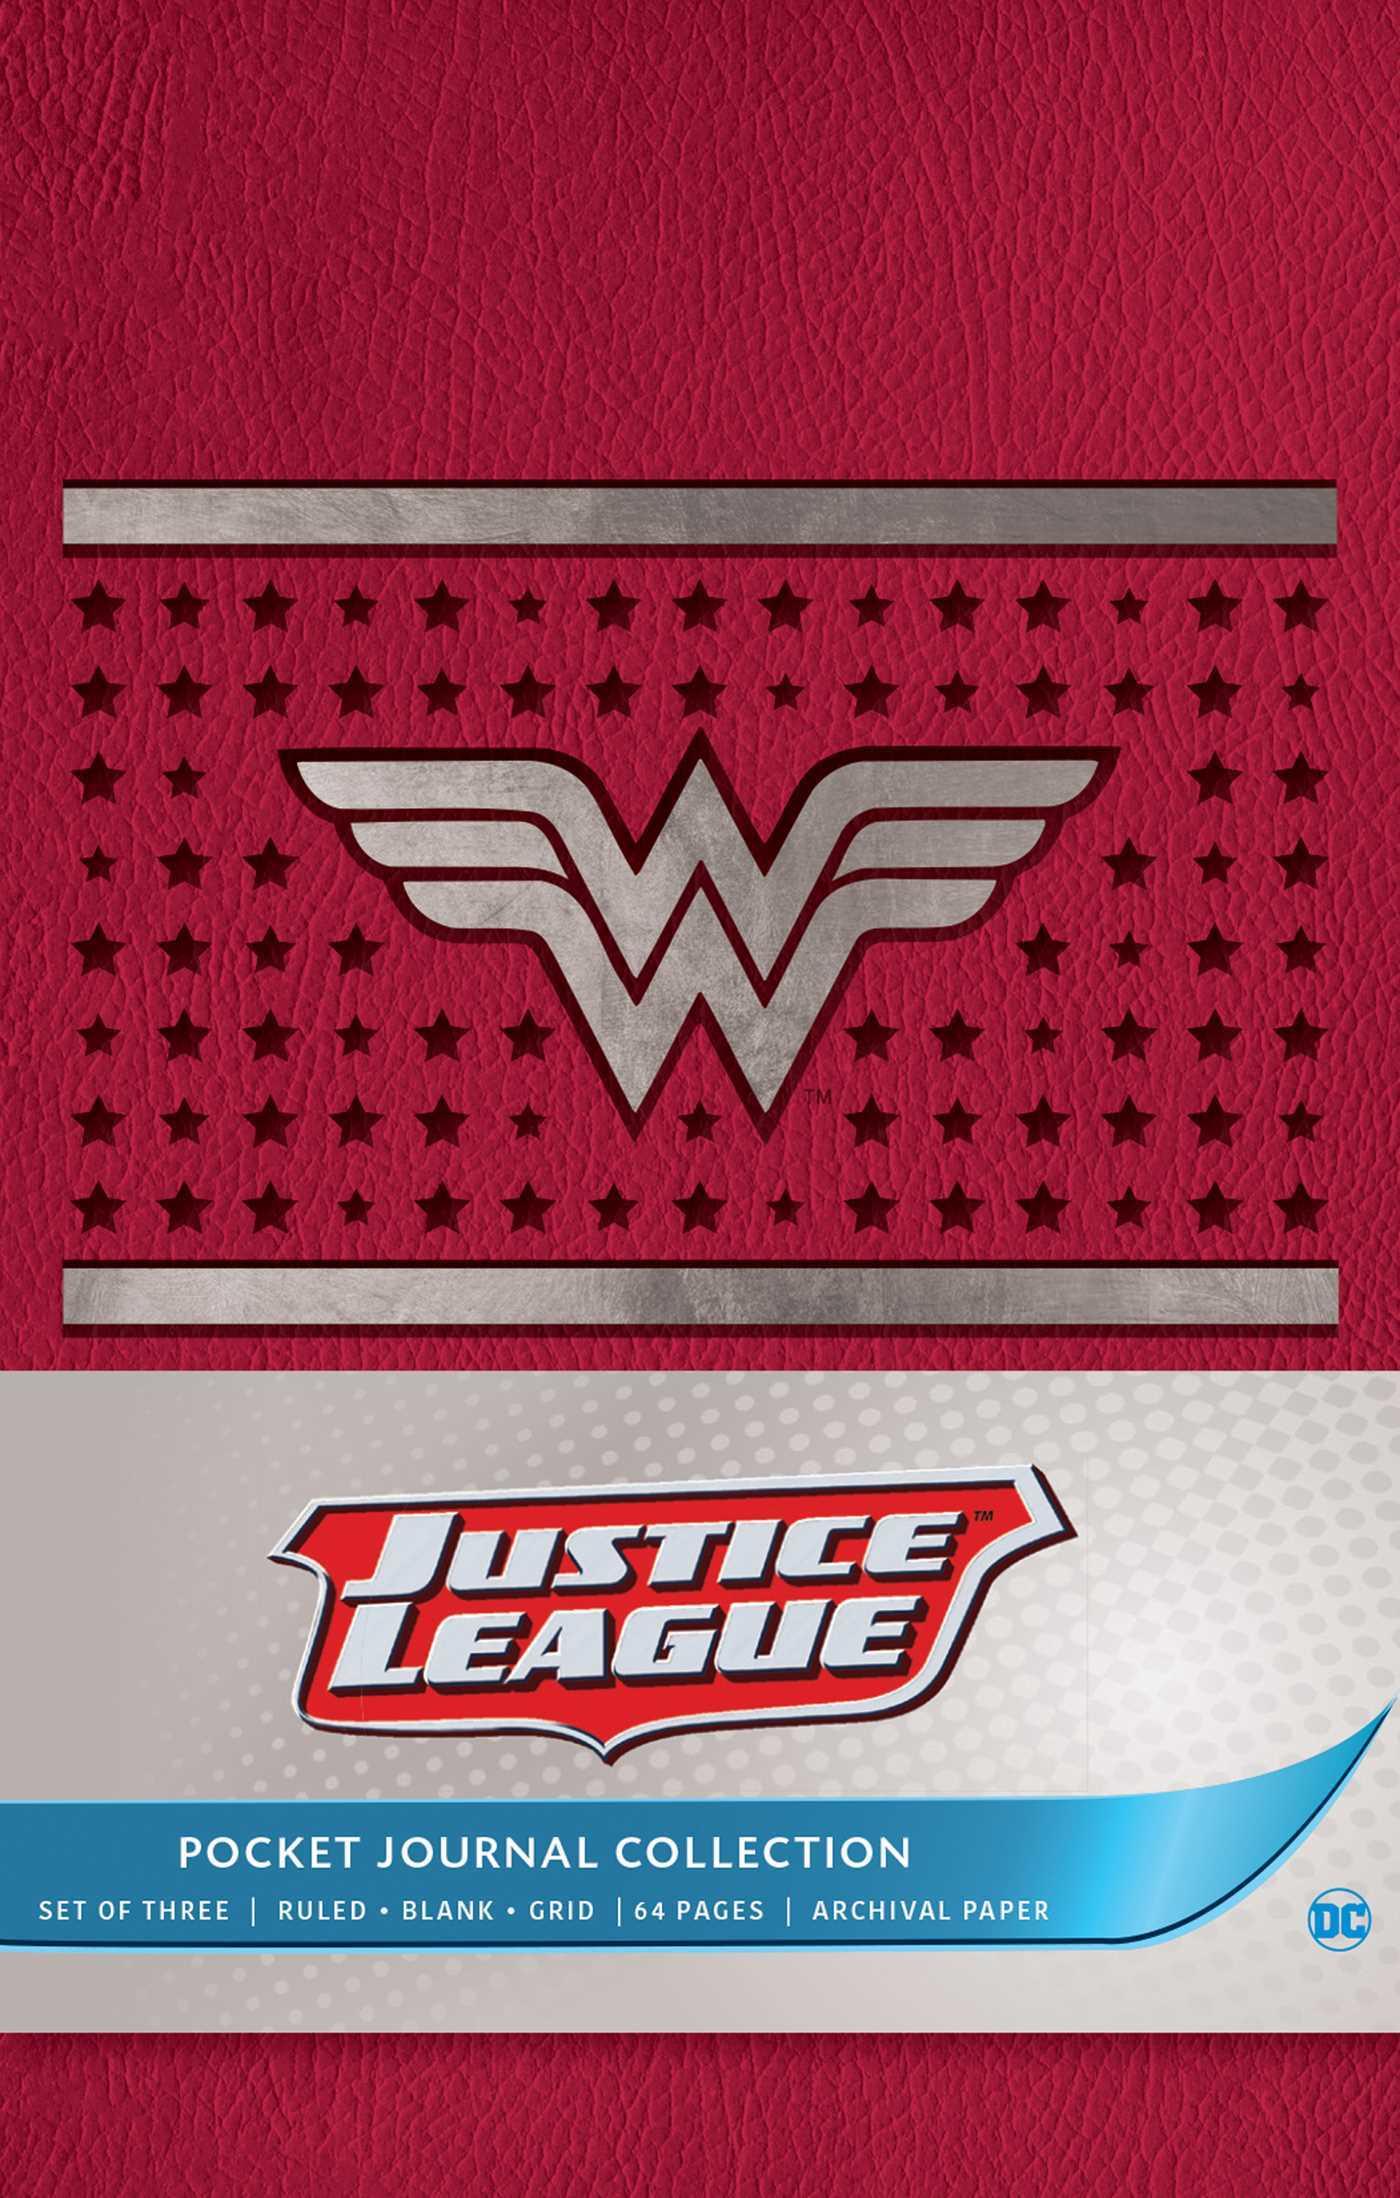 DC Comics: Justice League Pocket Journal Collection (Set of 3)